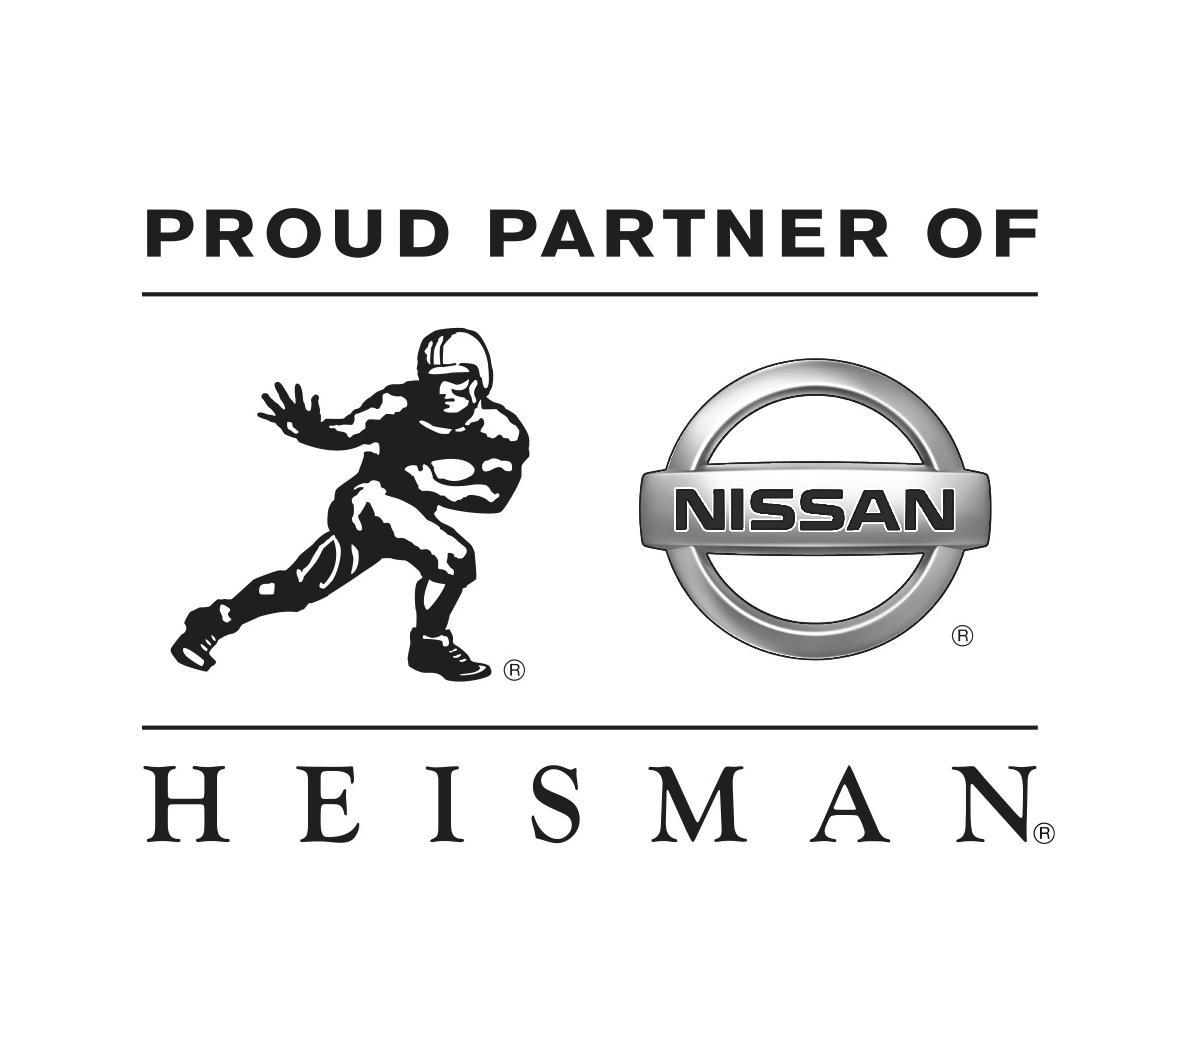 Nissan Heisman House logo